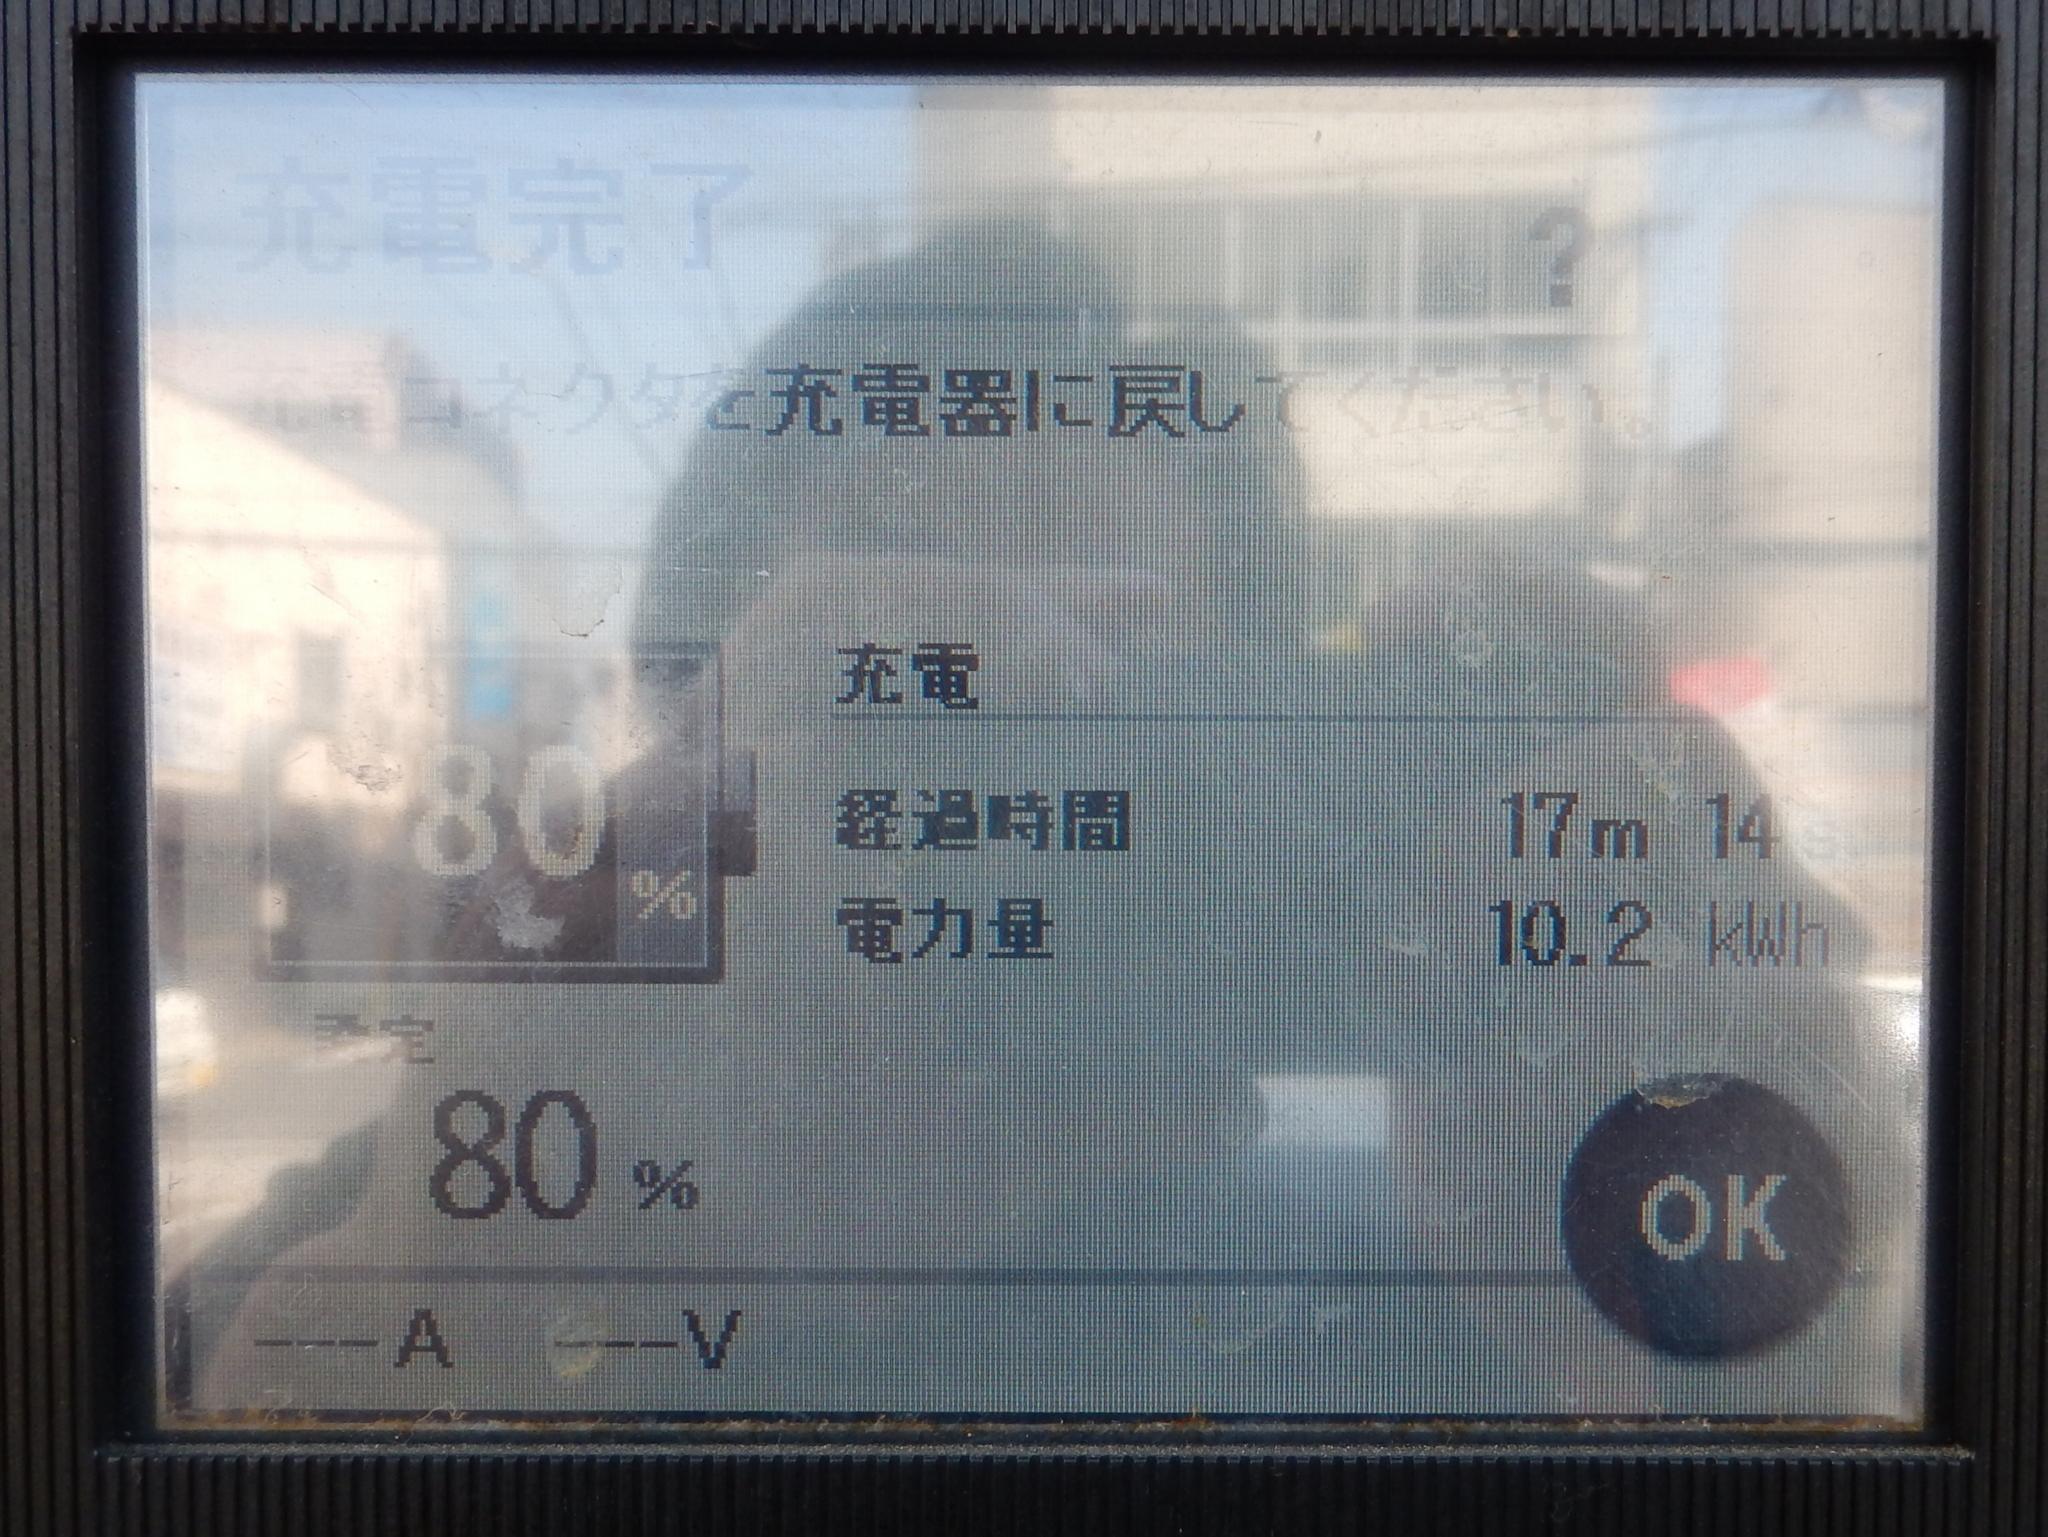 f:id:ToshUeno:20150513142337j:plain